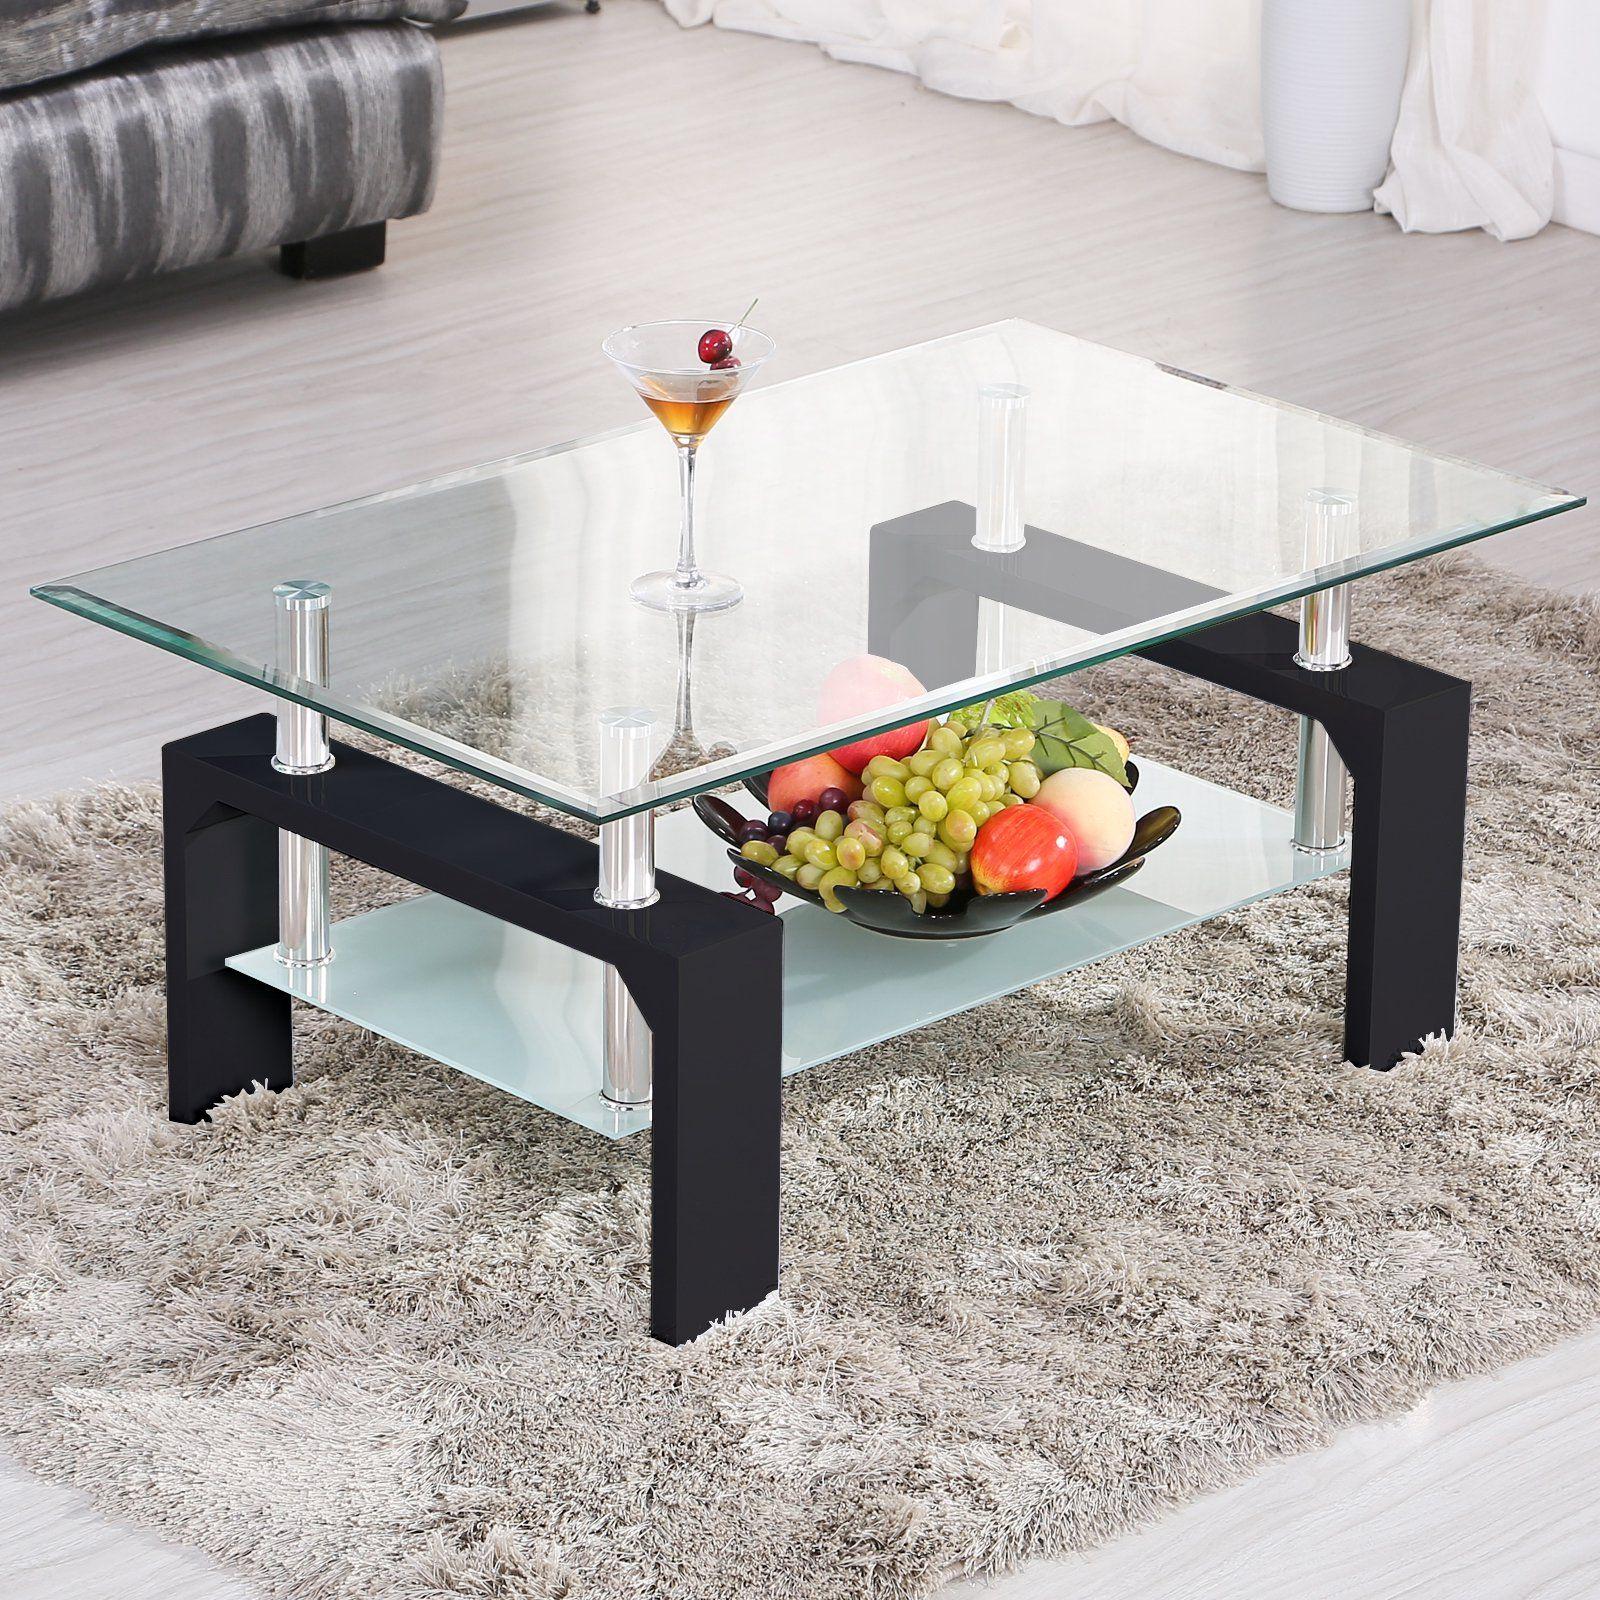 Uenjoy Rectangular Glass Coffee Table Shelf Chrome Black Wood Living Room Furniture Black Walmart Com Black Wood Living Room Furniture Side Coffee Table Coffee Table [ 1600 x 1600 Pixel ]